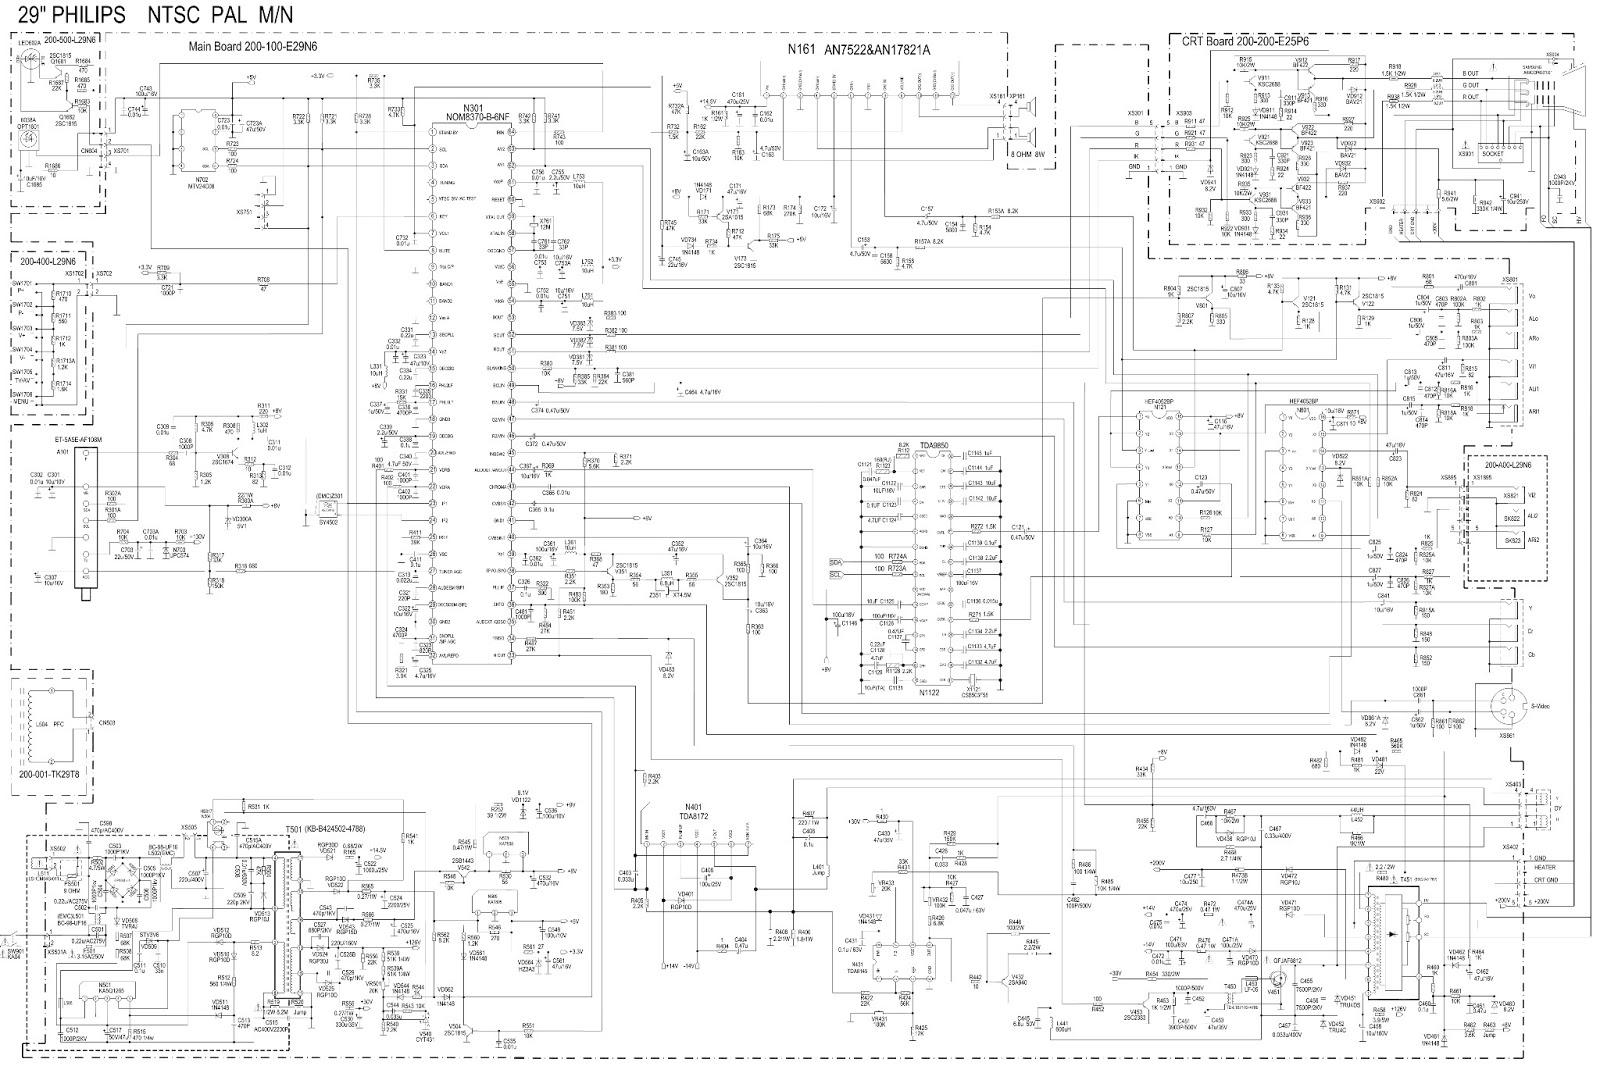 "Electro help: PHILIPS 29"" - PROVIEW - TELESTAR TL29N6P ..."